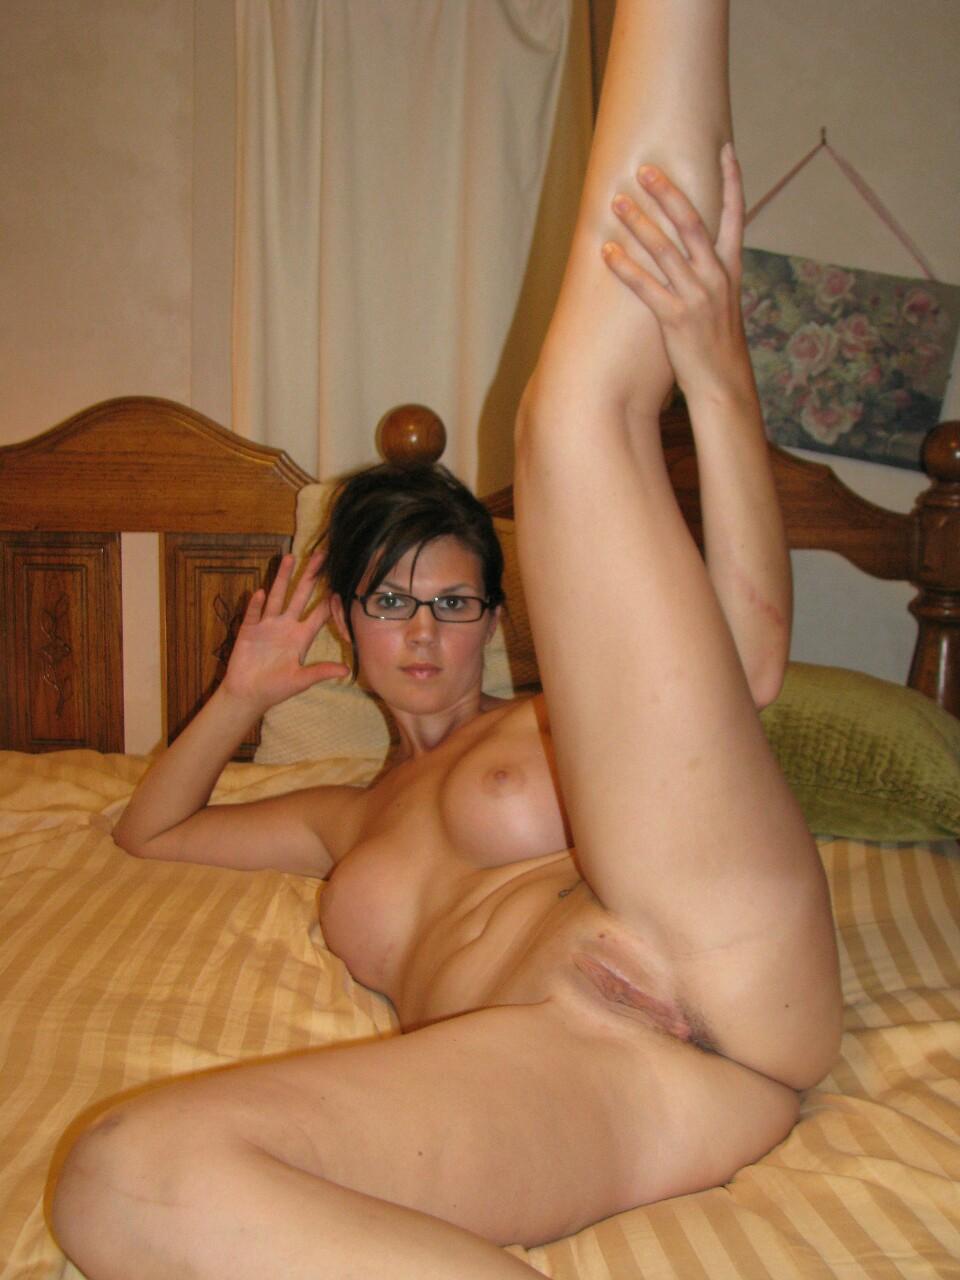 Hot Naked Moms Image 268509